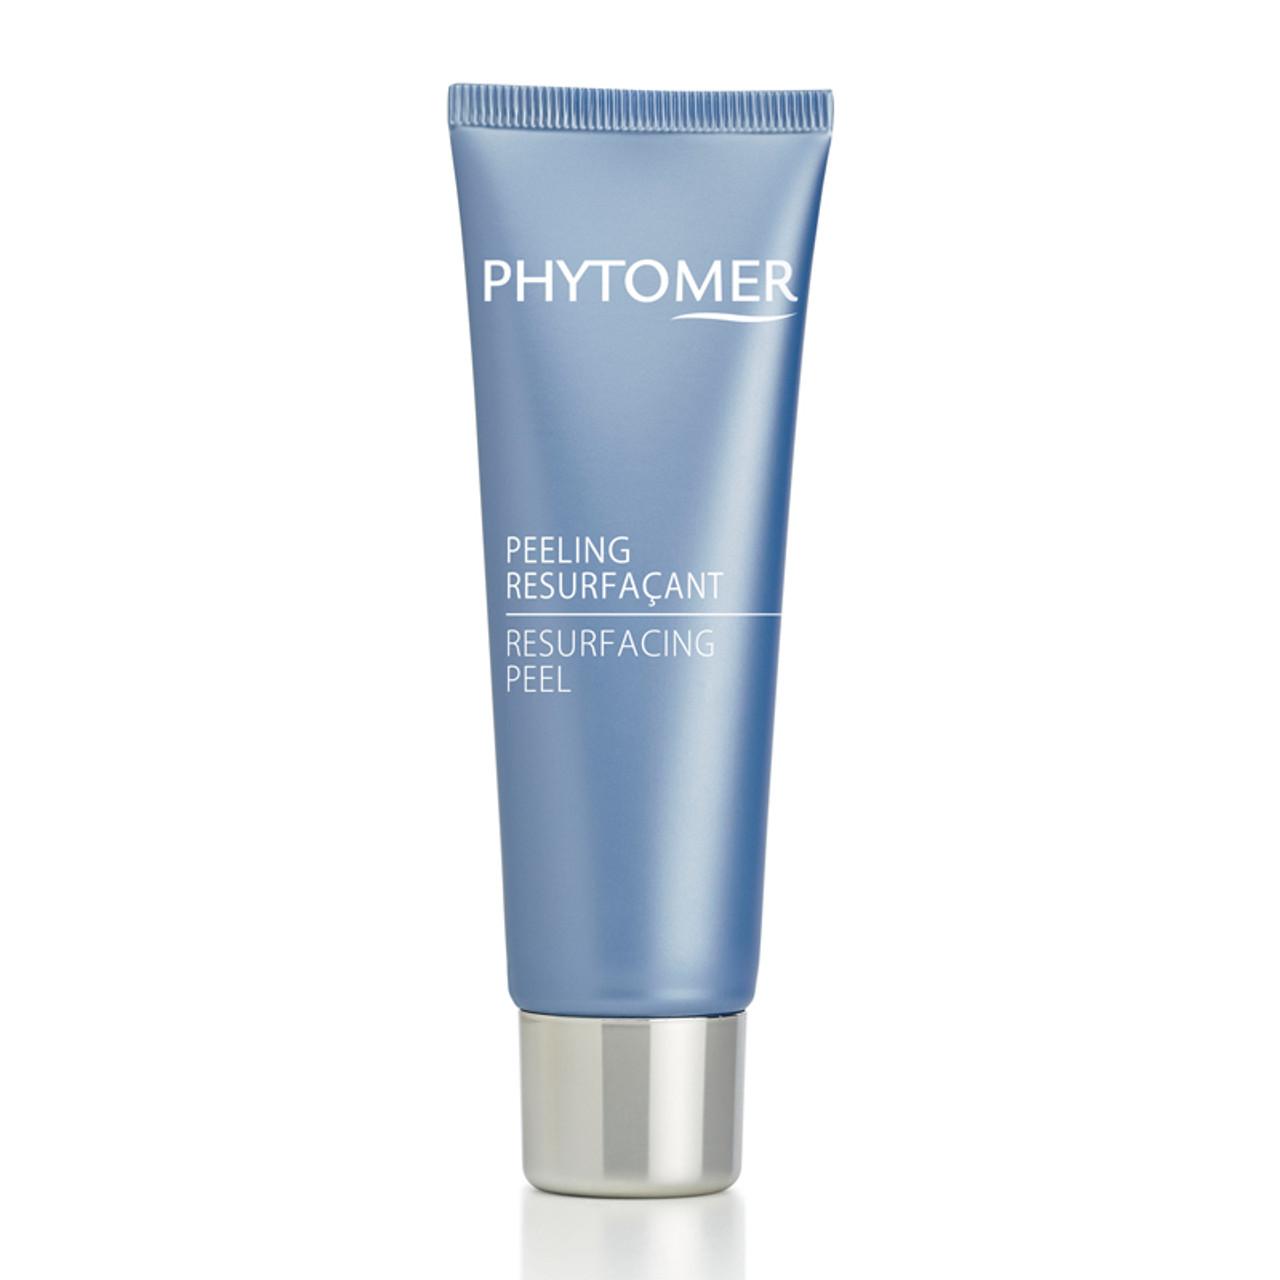 Phytomer Resurfacing Peel